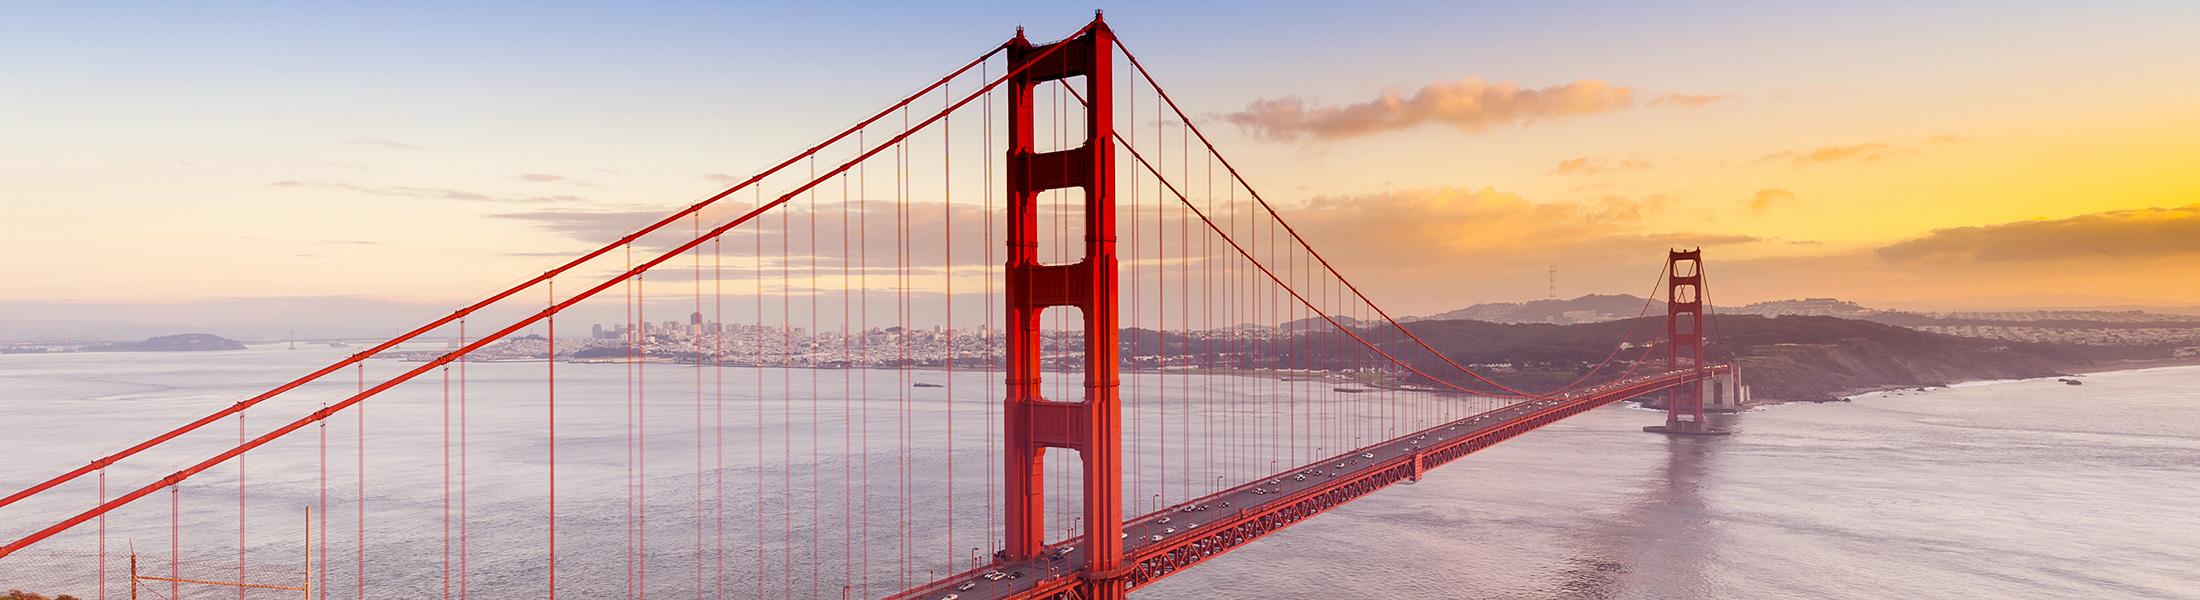 Golden Gate Bridge in North America